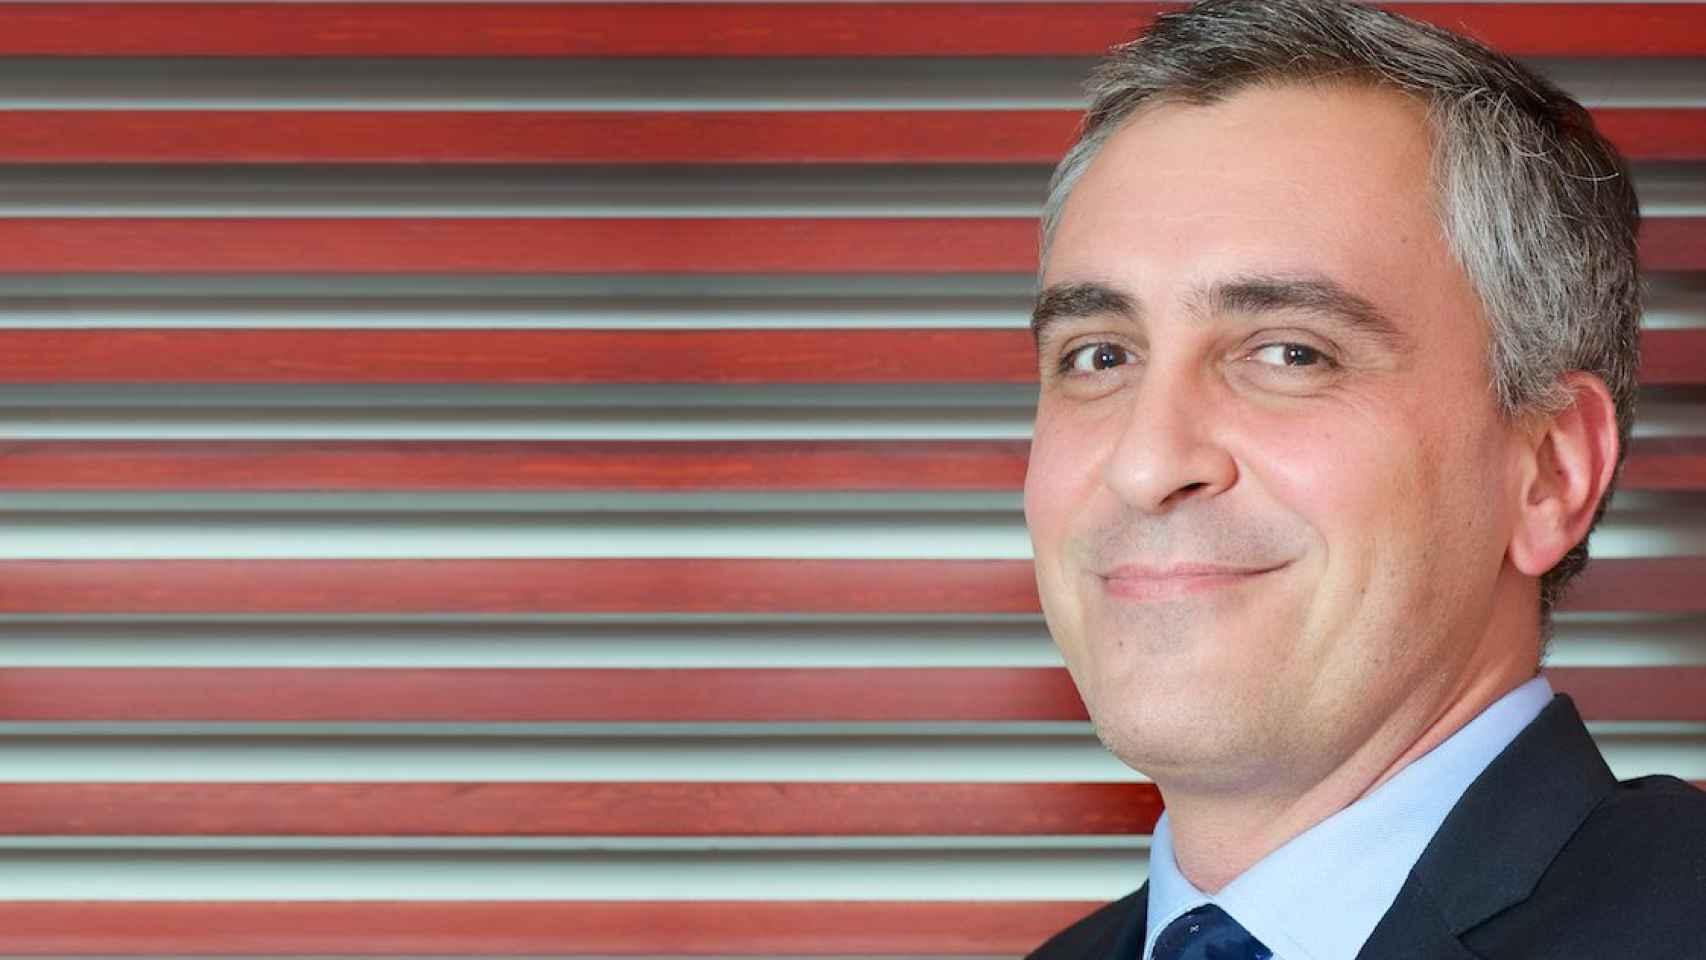 Antonio Bocigas, Sales & Business Development Director, Telco, Lenovo Data Center Group EMEA